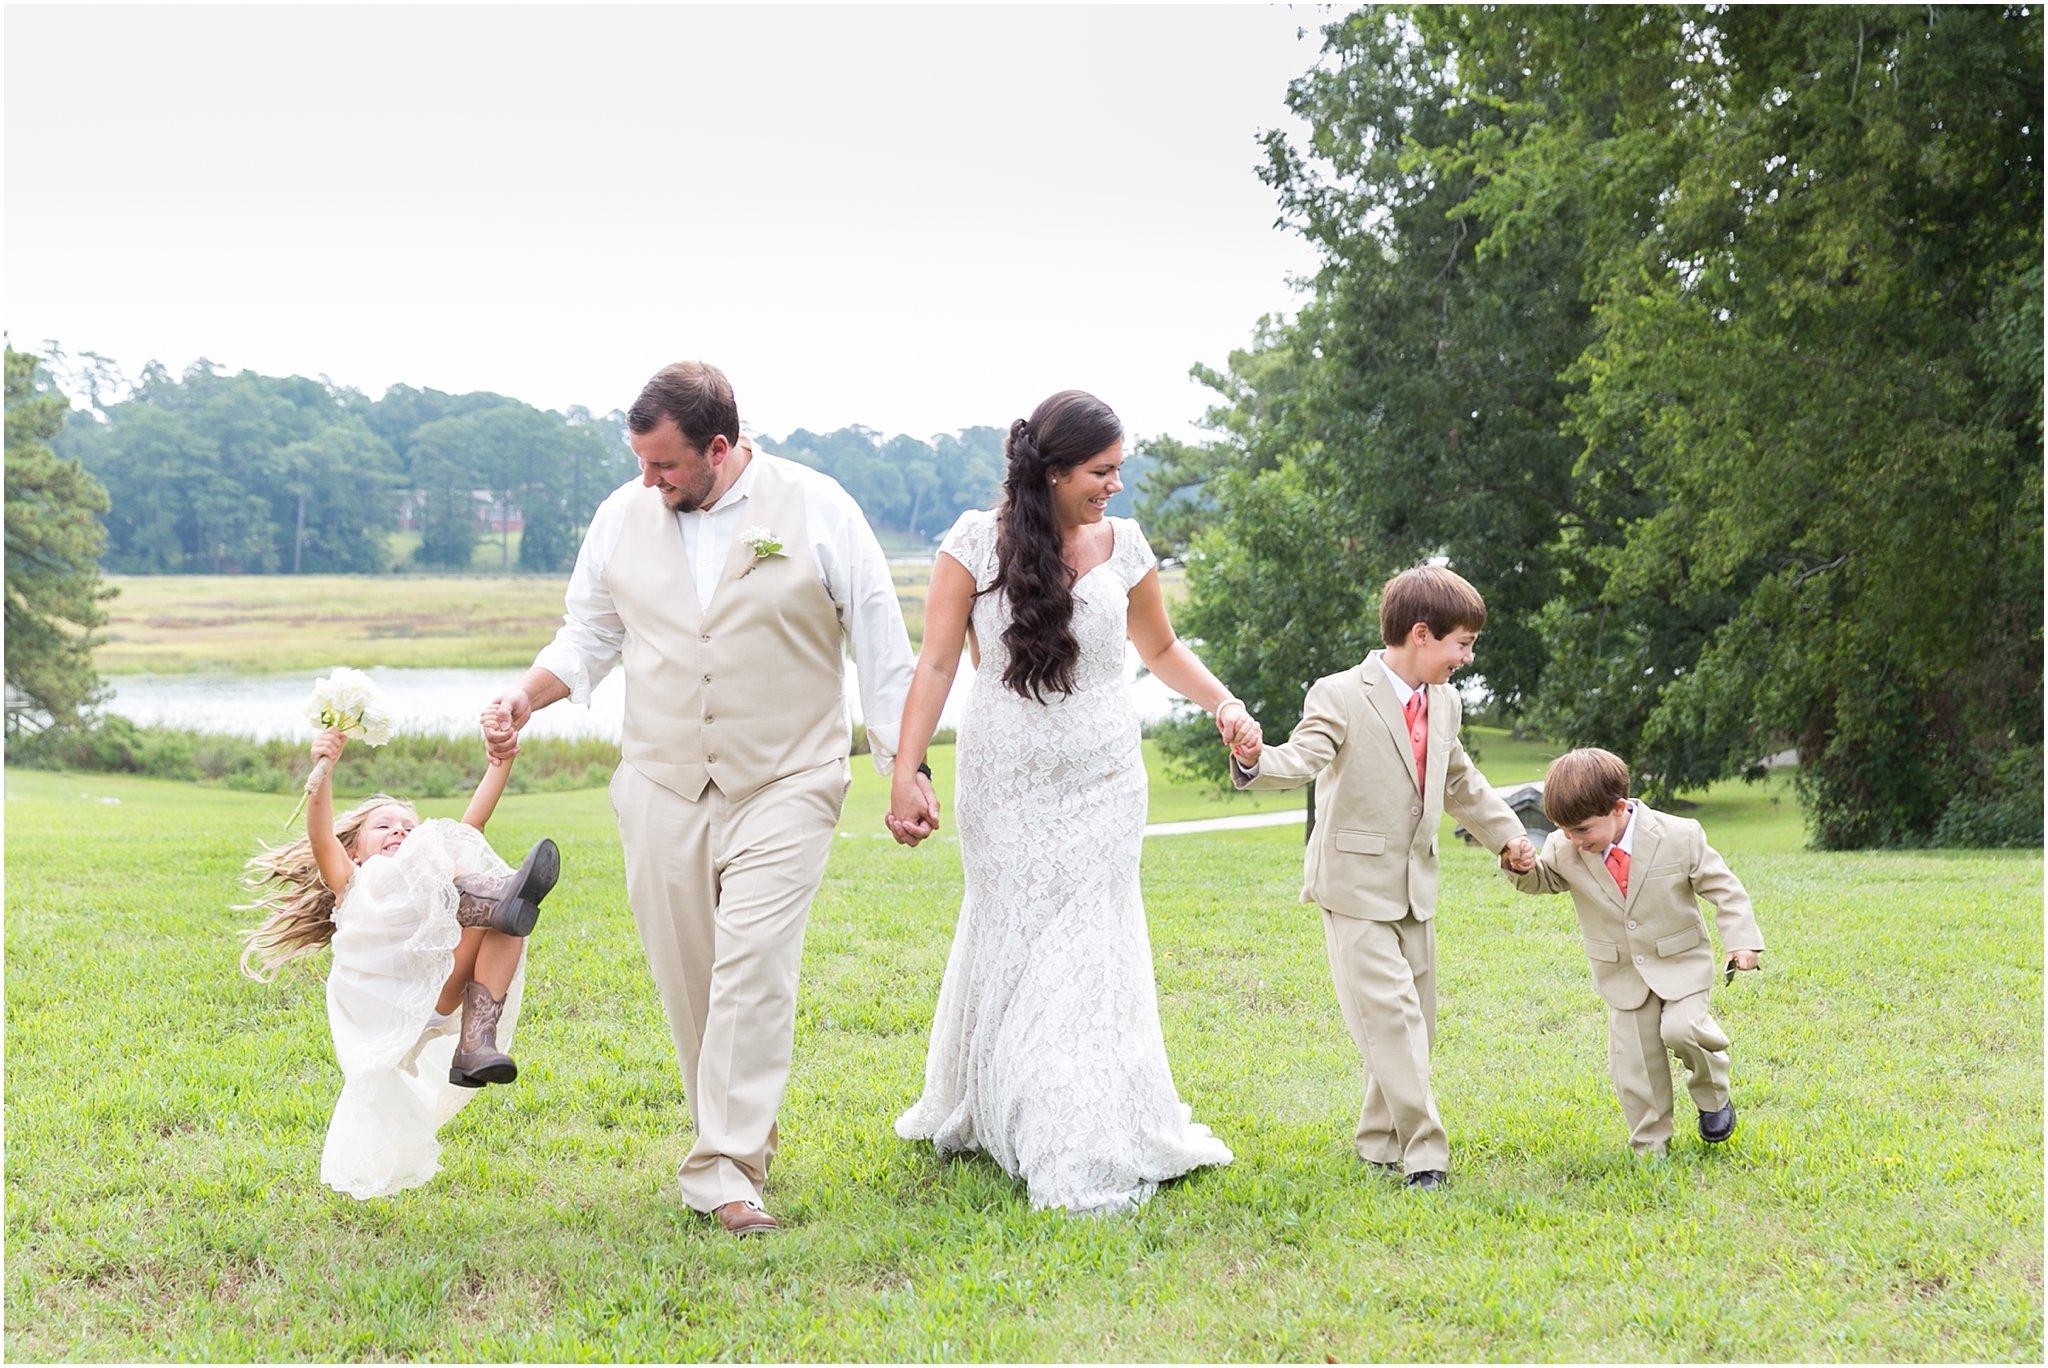 jessica_ryan_photography_wedding_hampton_roads_virginia_virginia_beach_weddings_0612